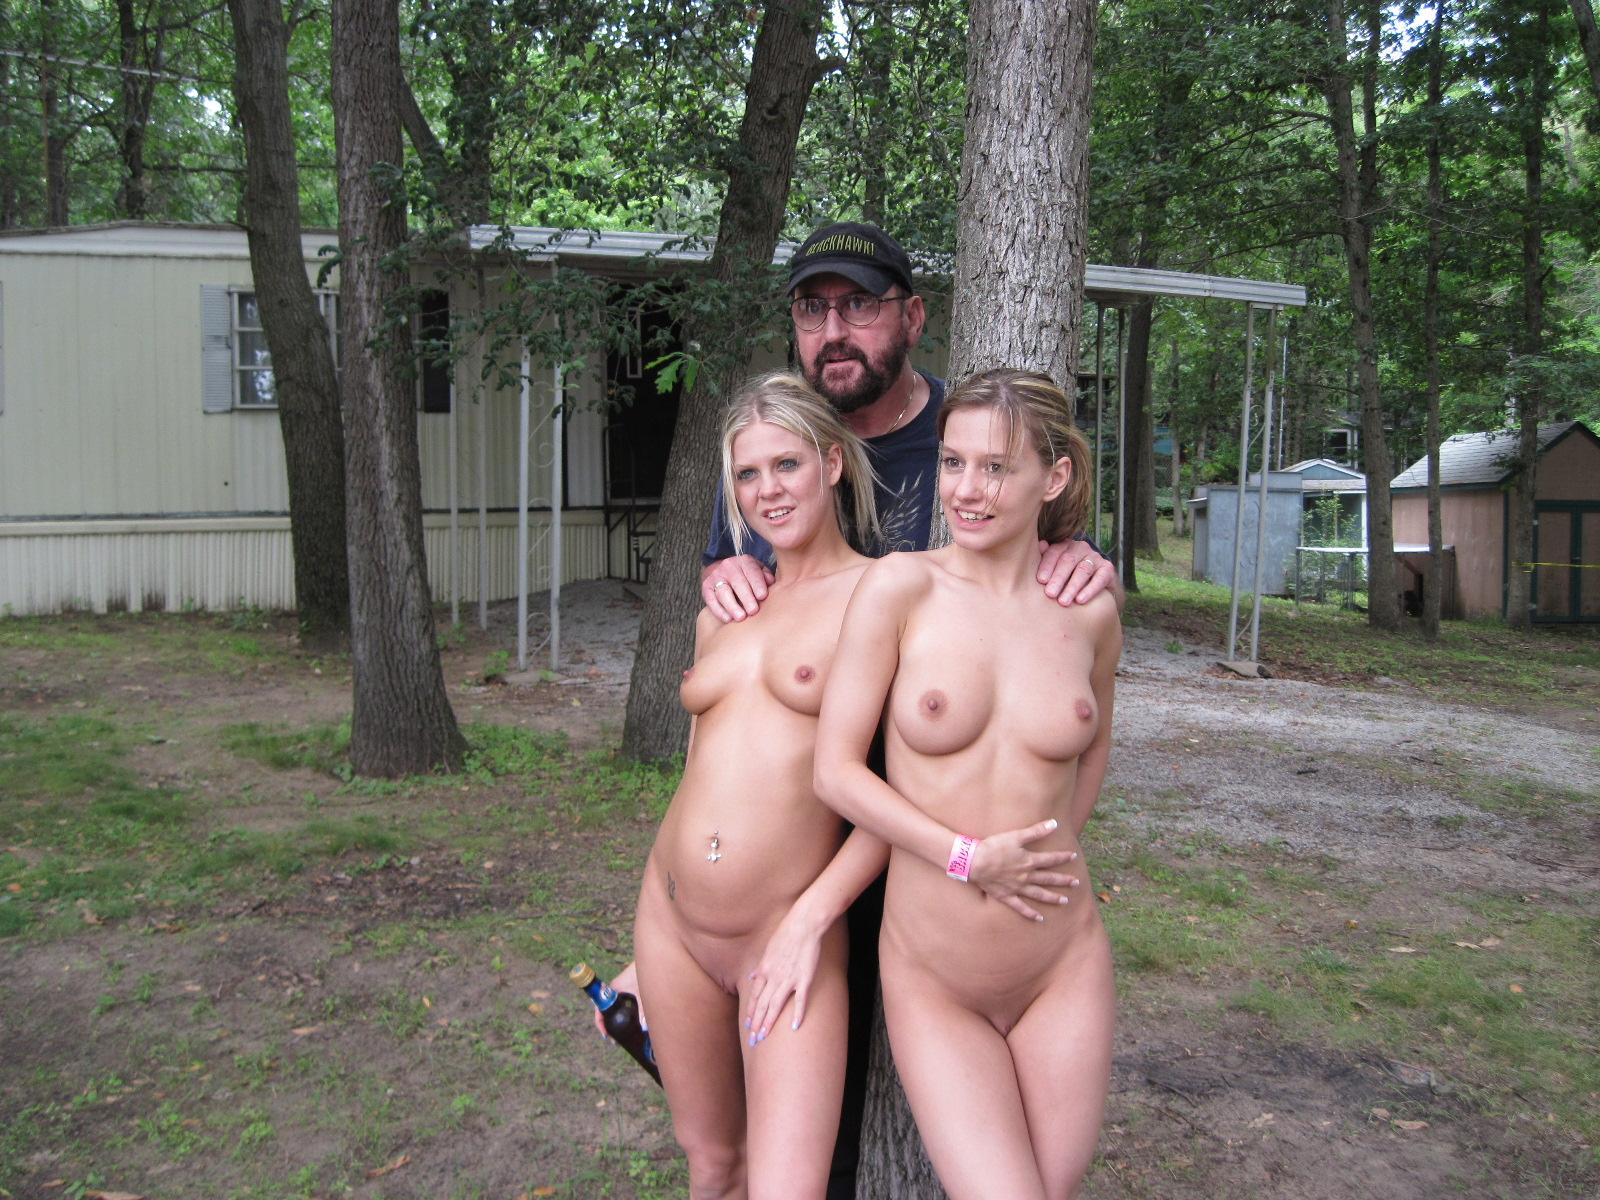 Naga womend fuck images pics naked tube